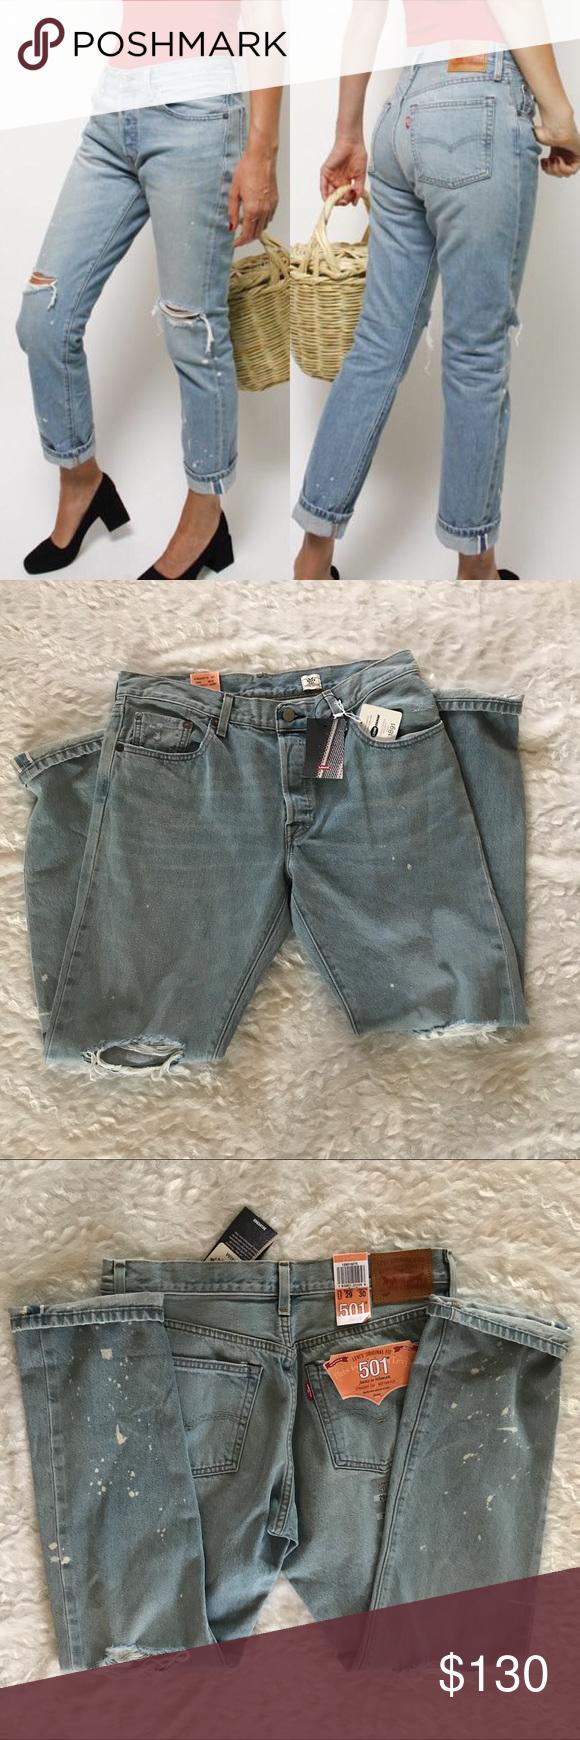 1c241d45eb91 NEW Levi's 501 Selvedge White Oak Original Jeans NWT New with tags Levi's  501 Selvedge White